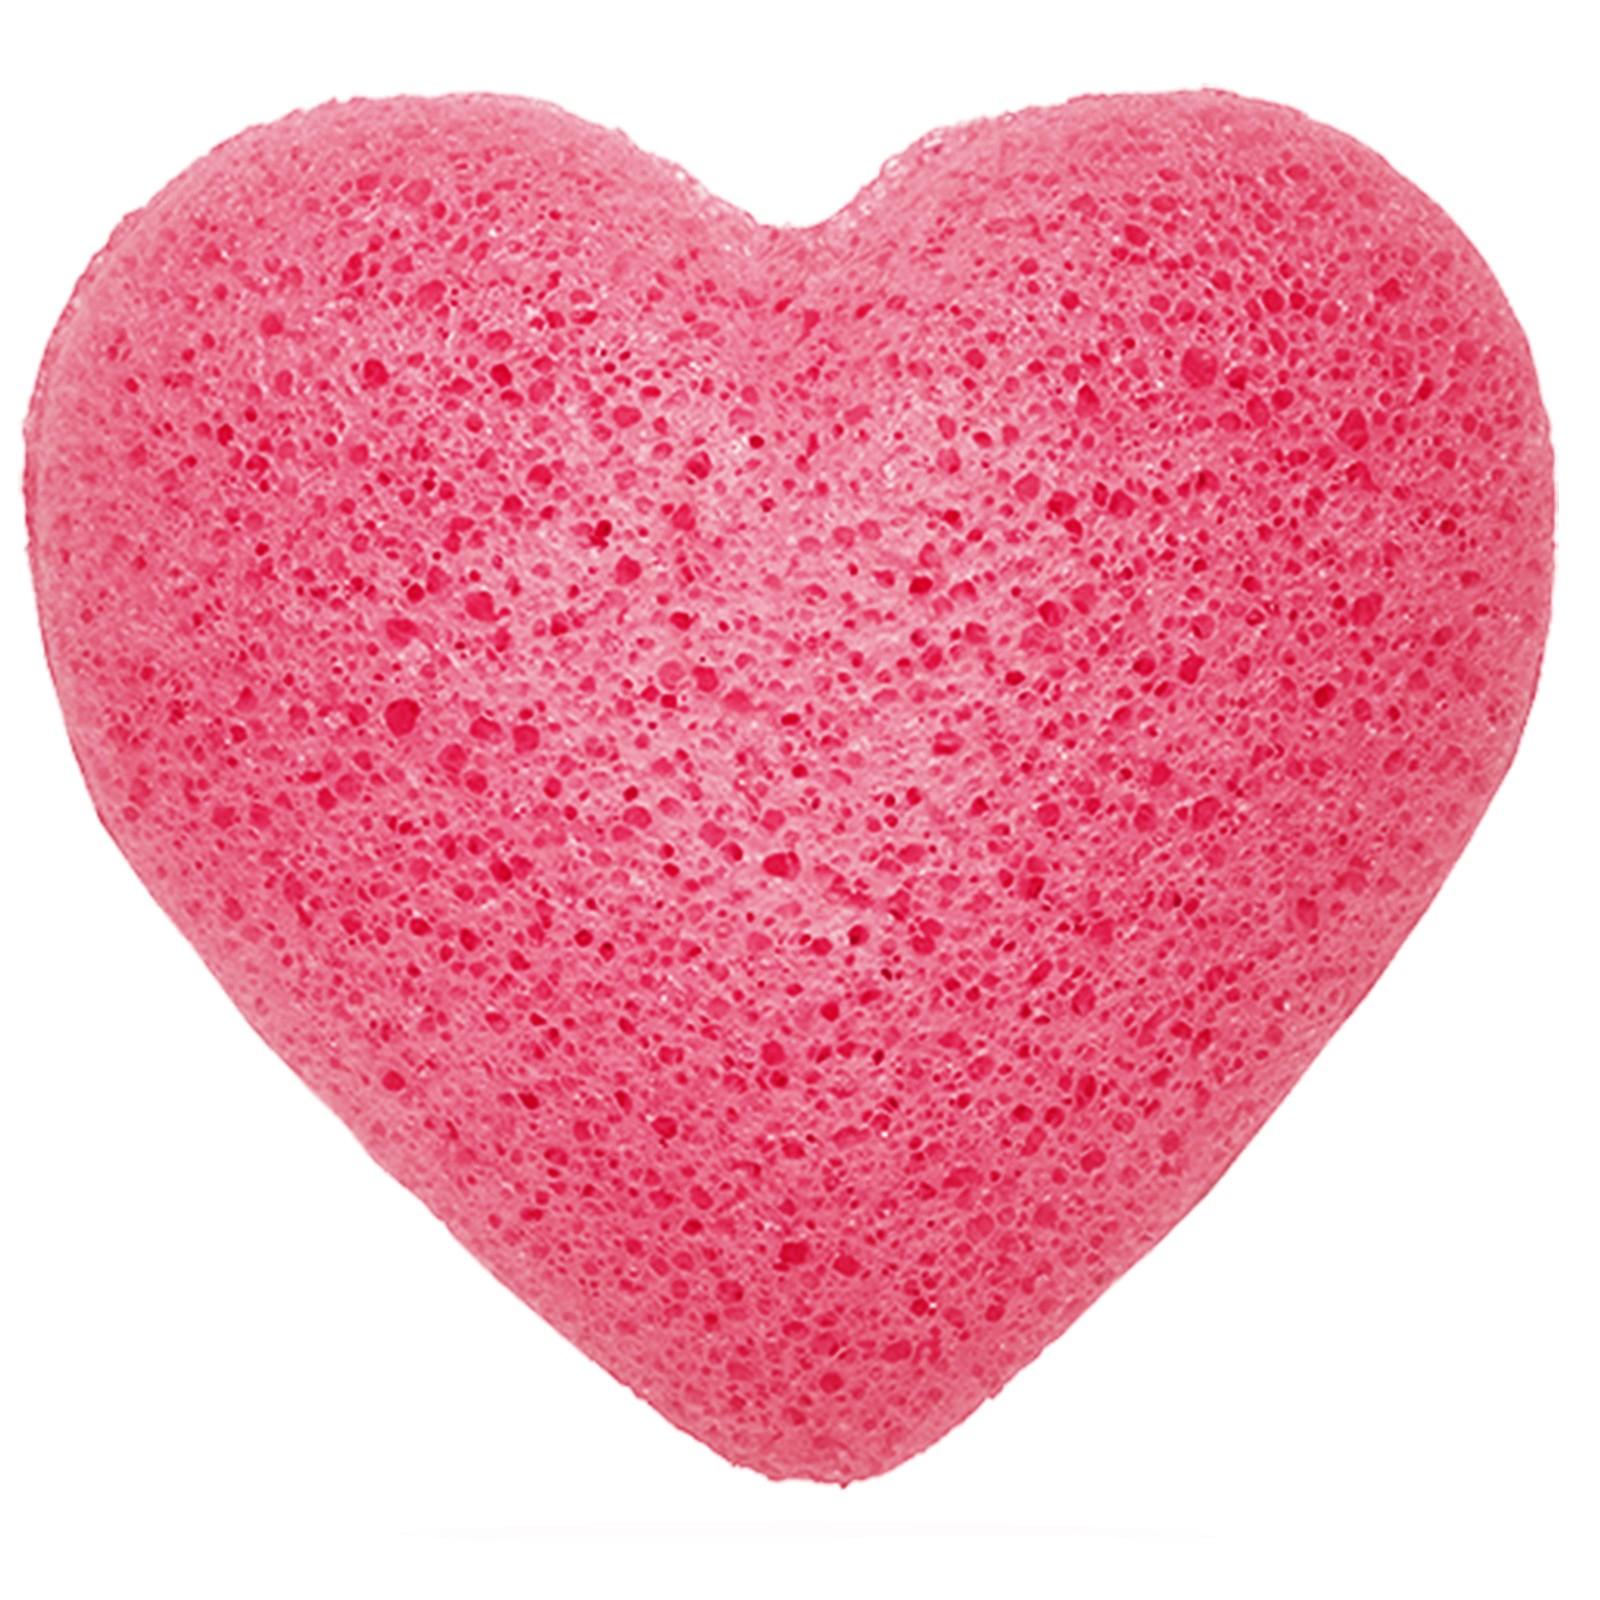 Japanese Konjac Heart Sponge - Rose